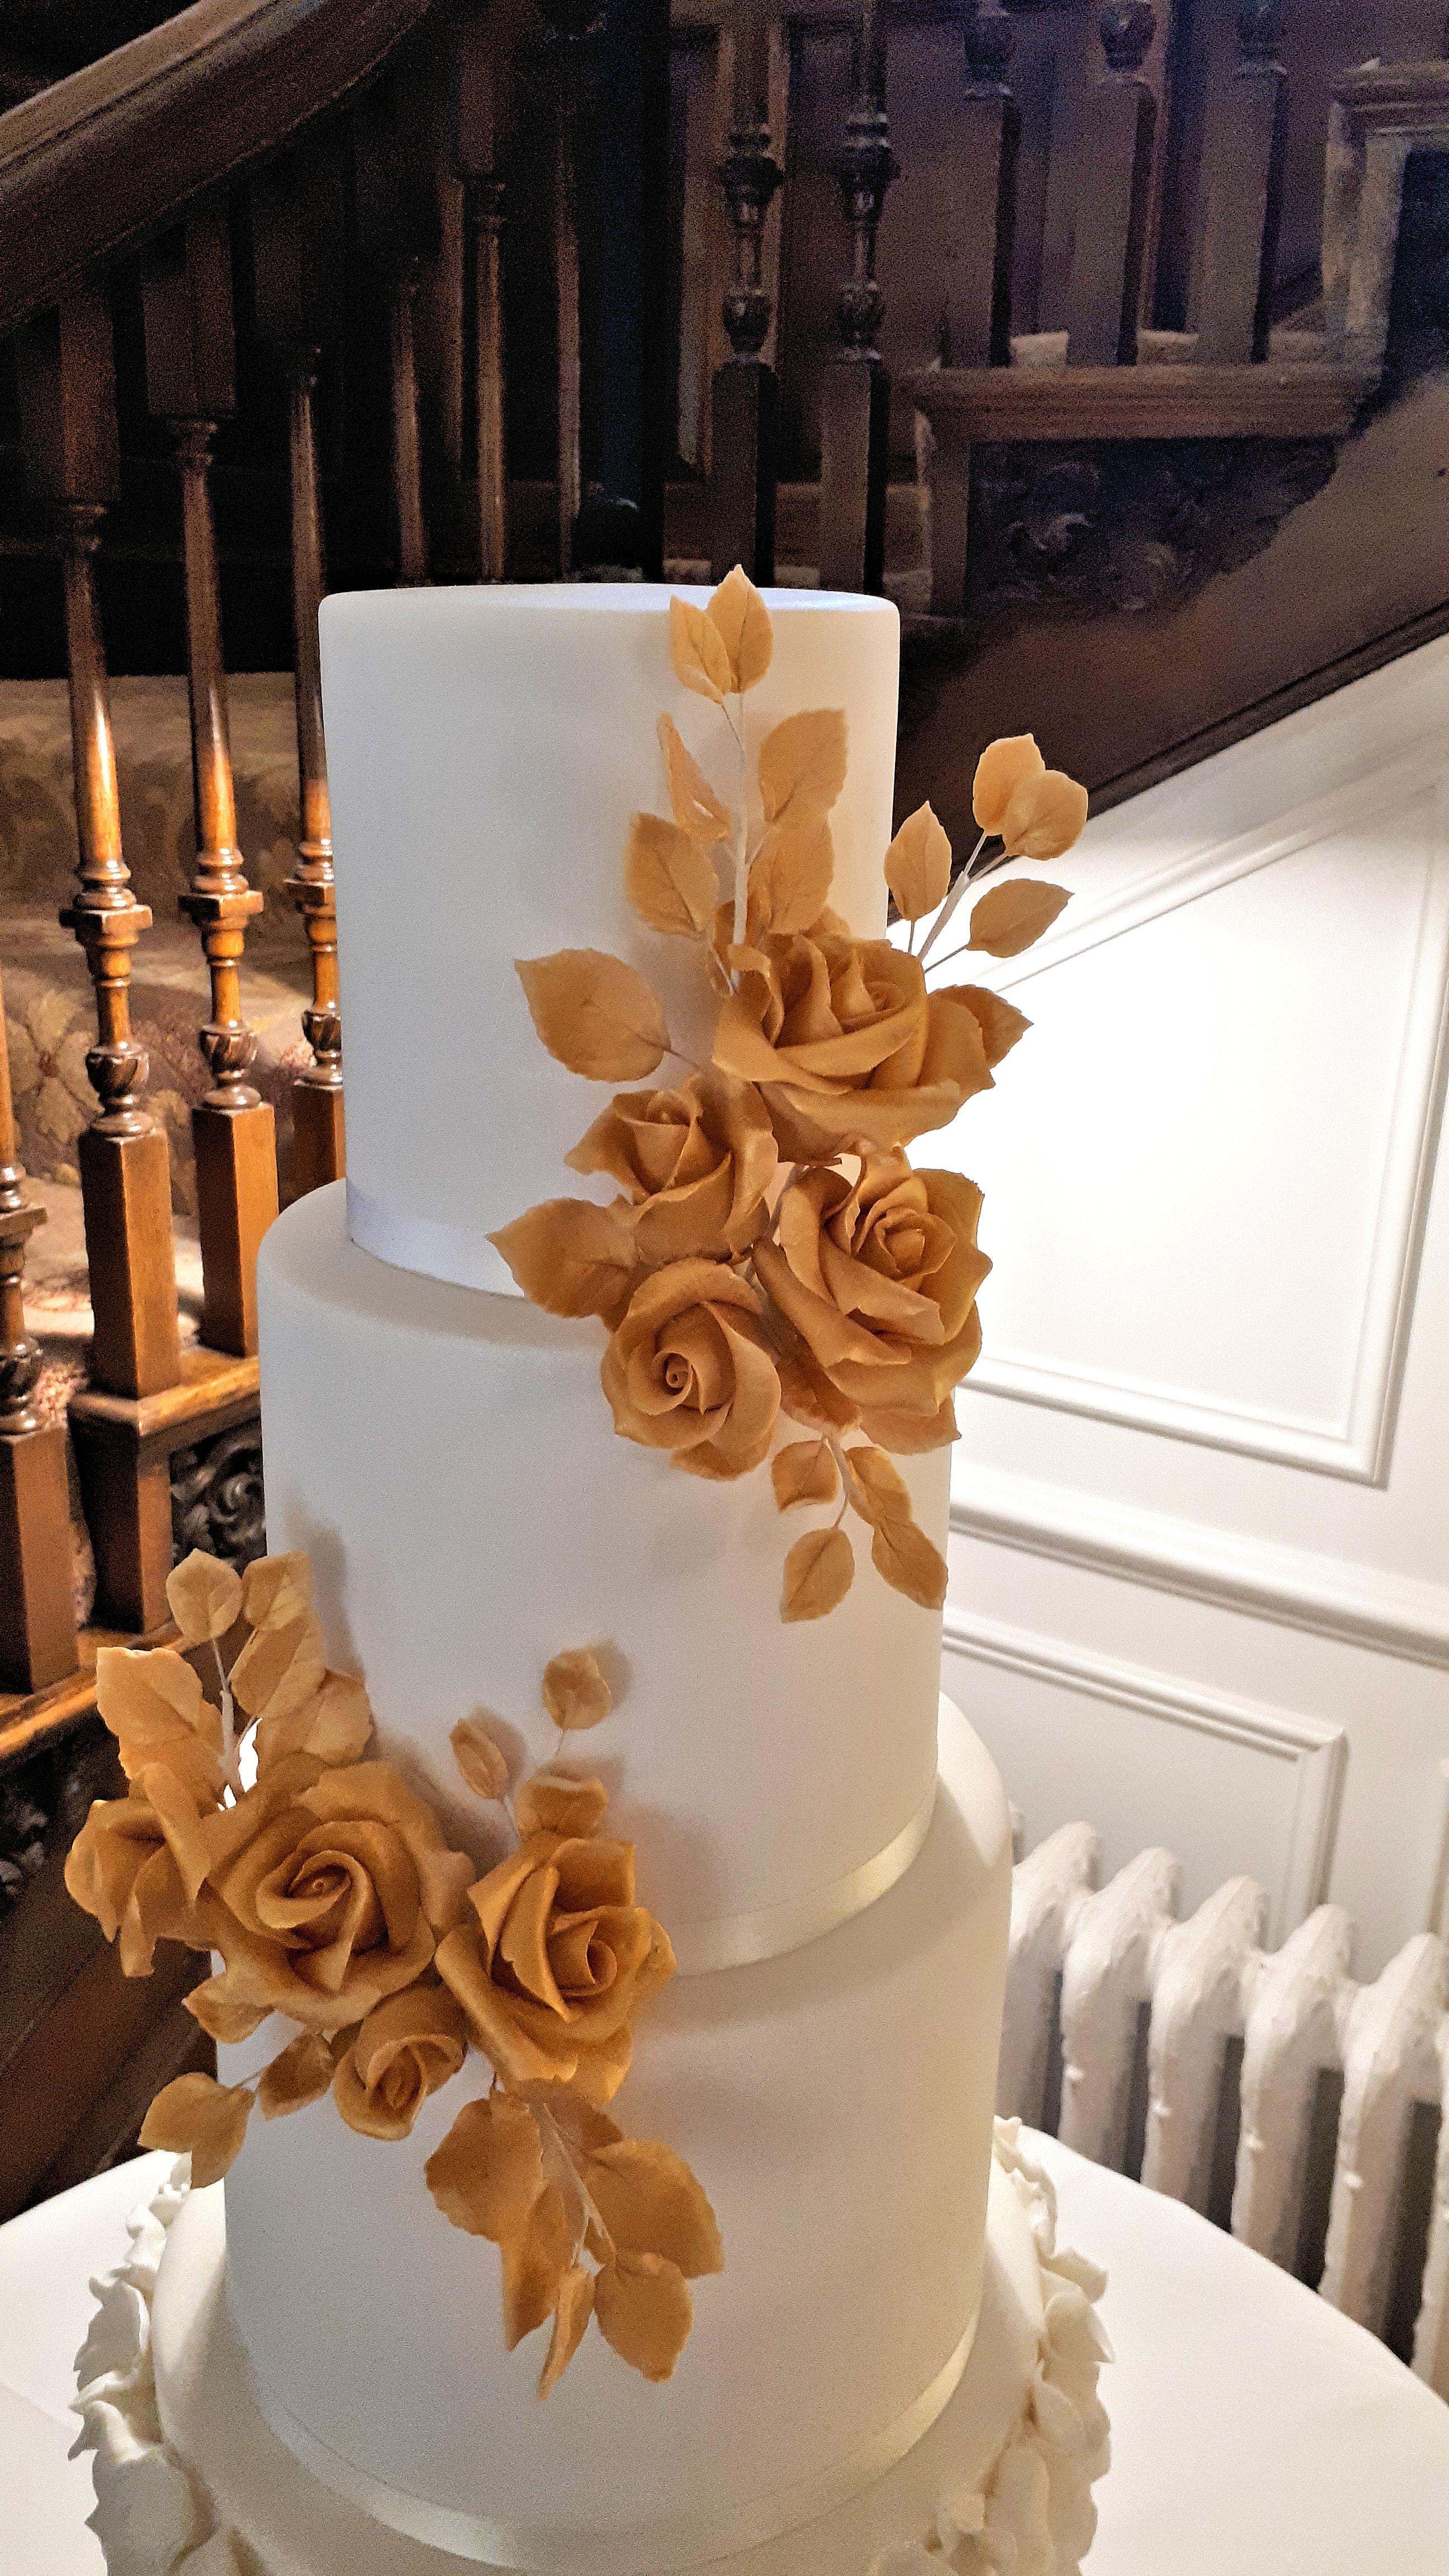 White Wedding Cake with Gold Roses